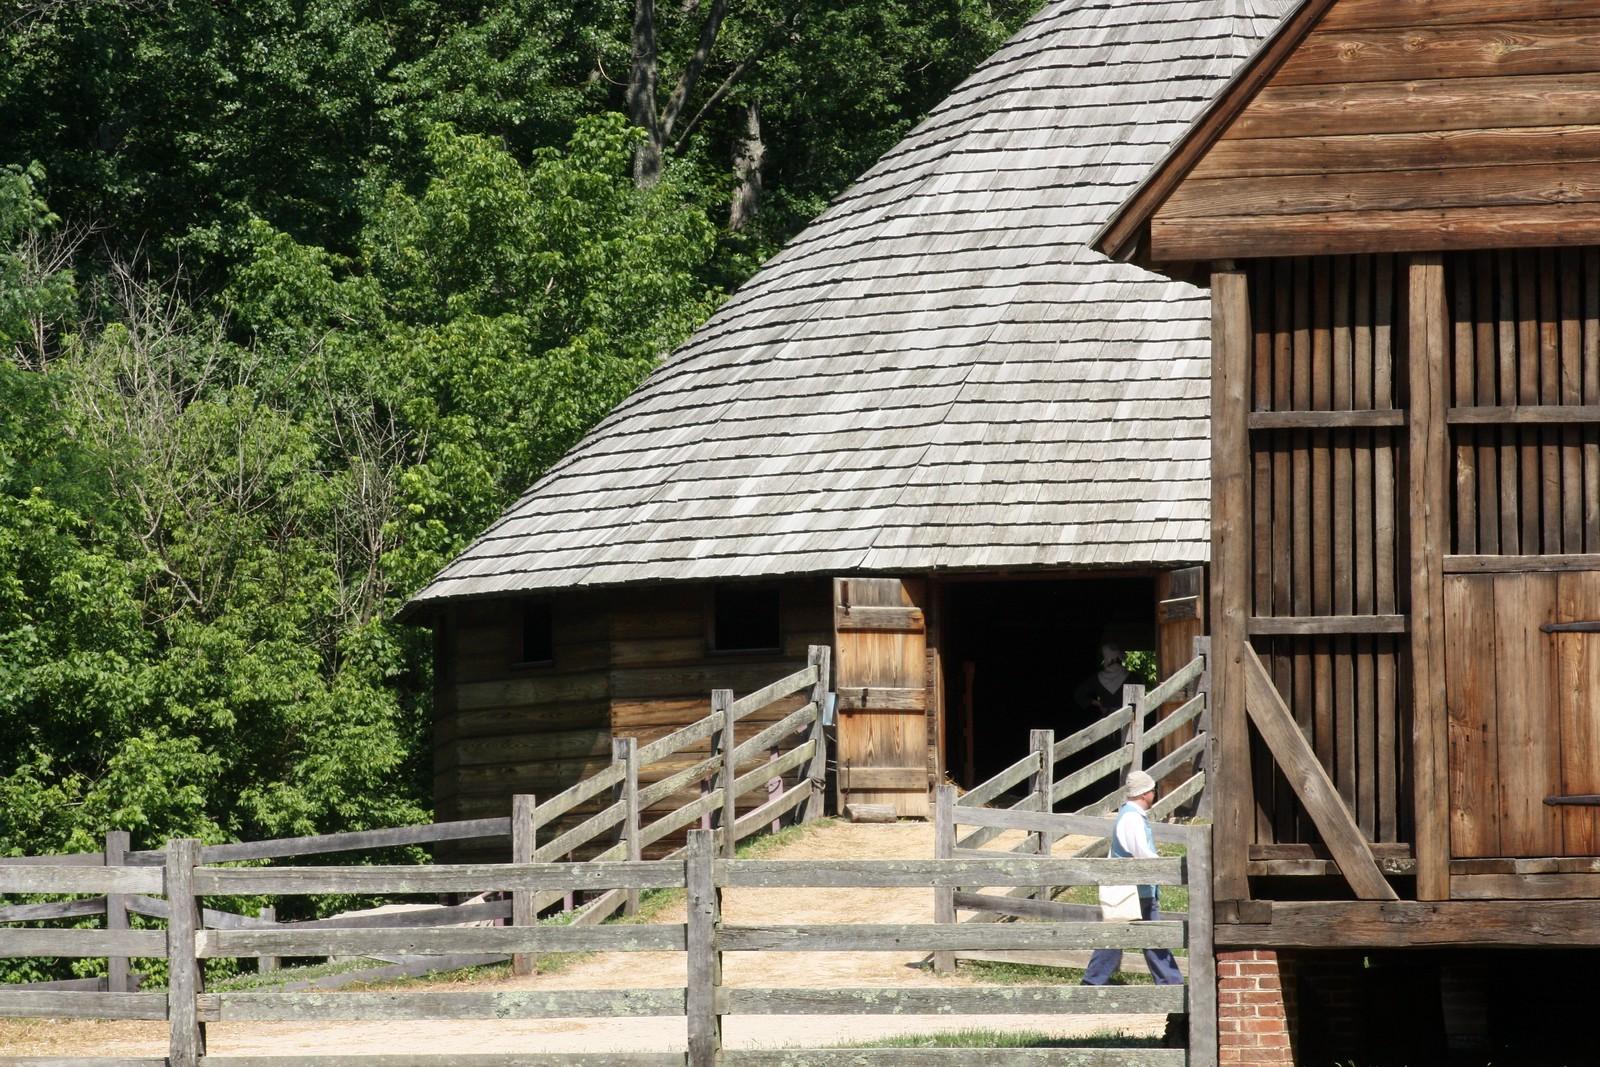 Mount Vernon 16 sided barn